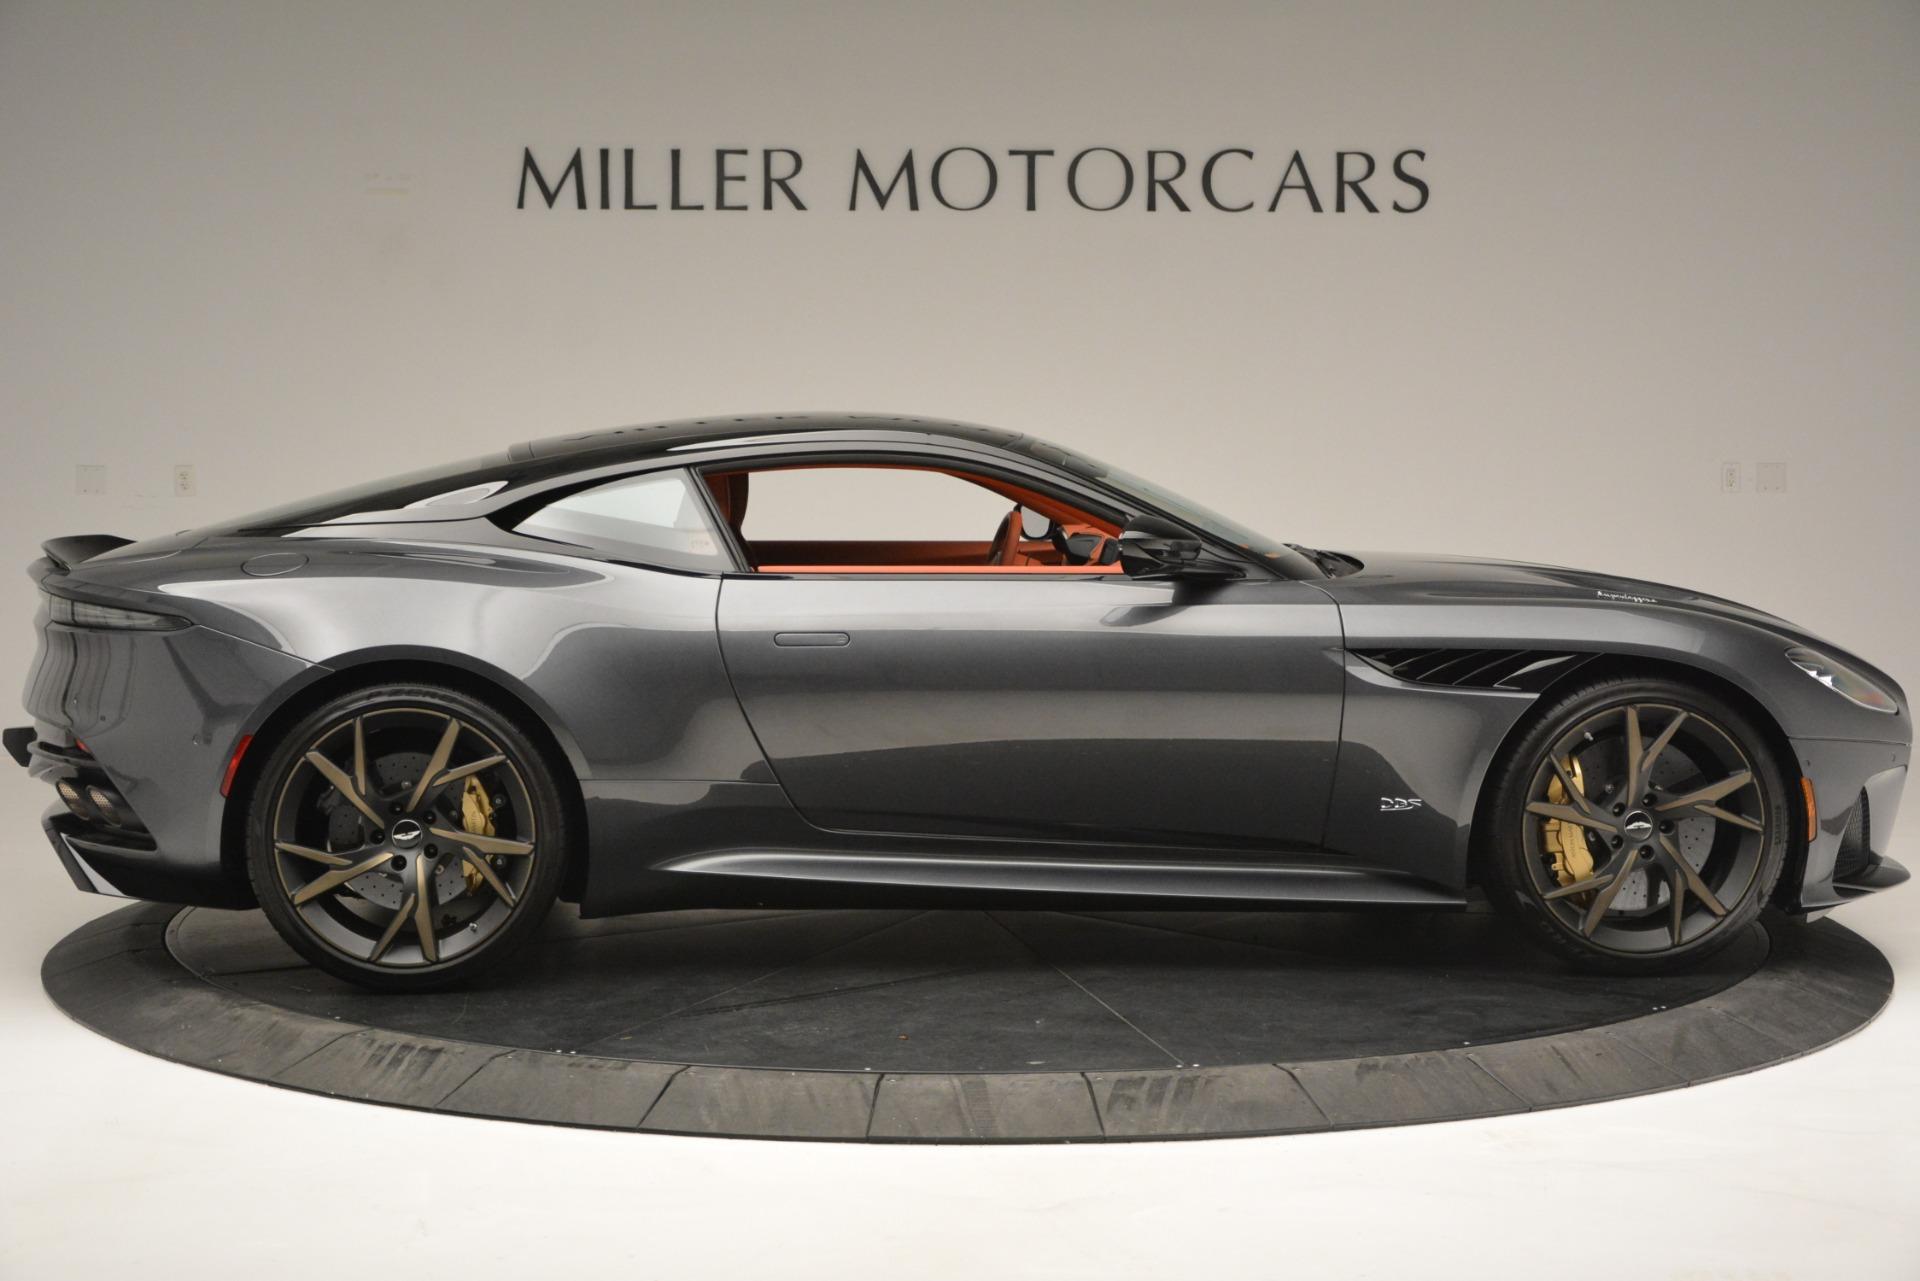 New 2019 Aston Martin DBS Superleggera For Sale In Greenwich, CT. Alfa Romeo of Greenwich, A1336 2827_p9